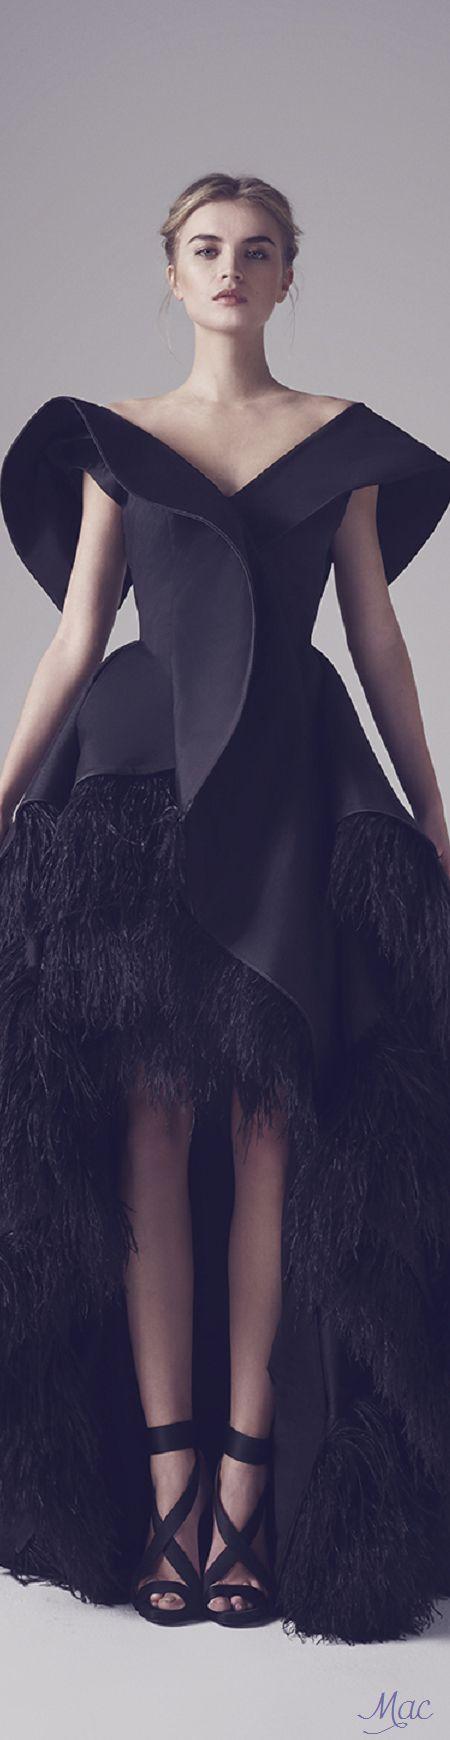 Spring 2016 Haute Couture Ashi Studio